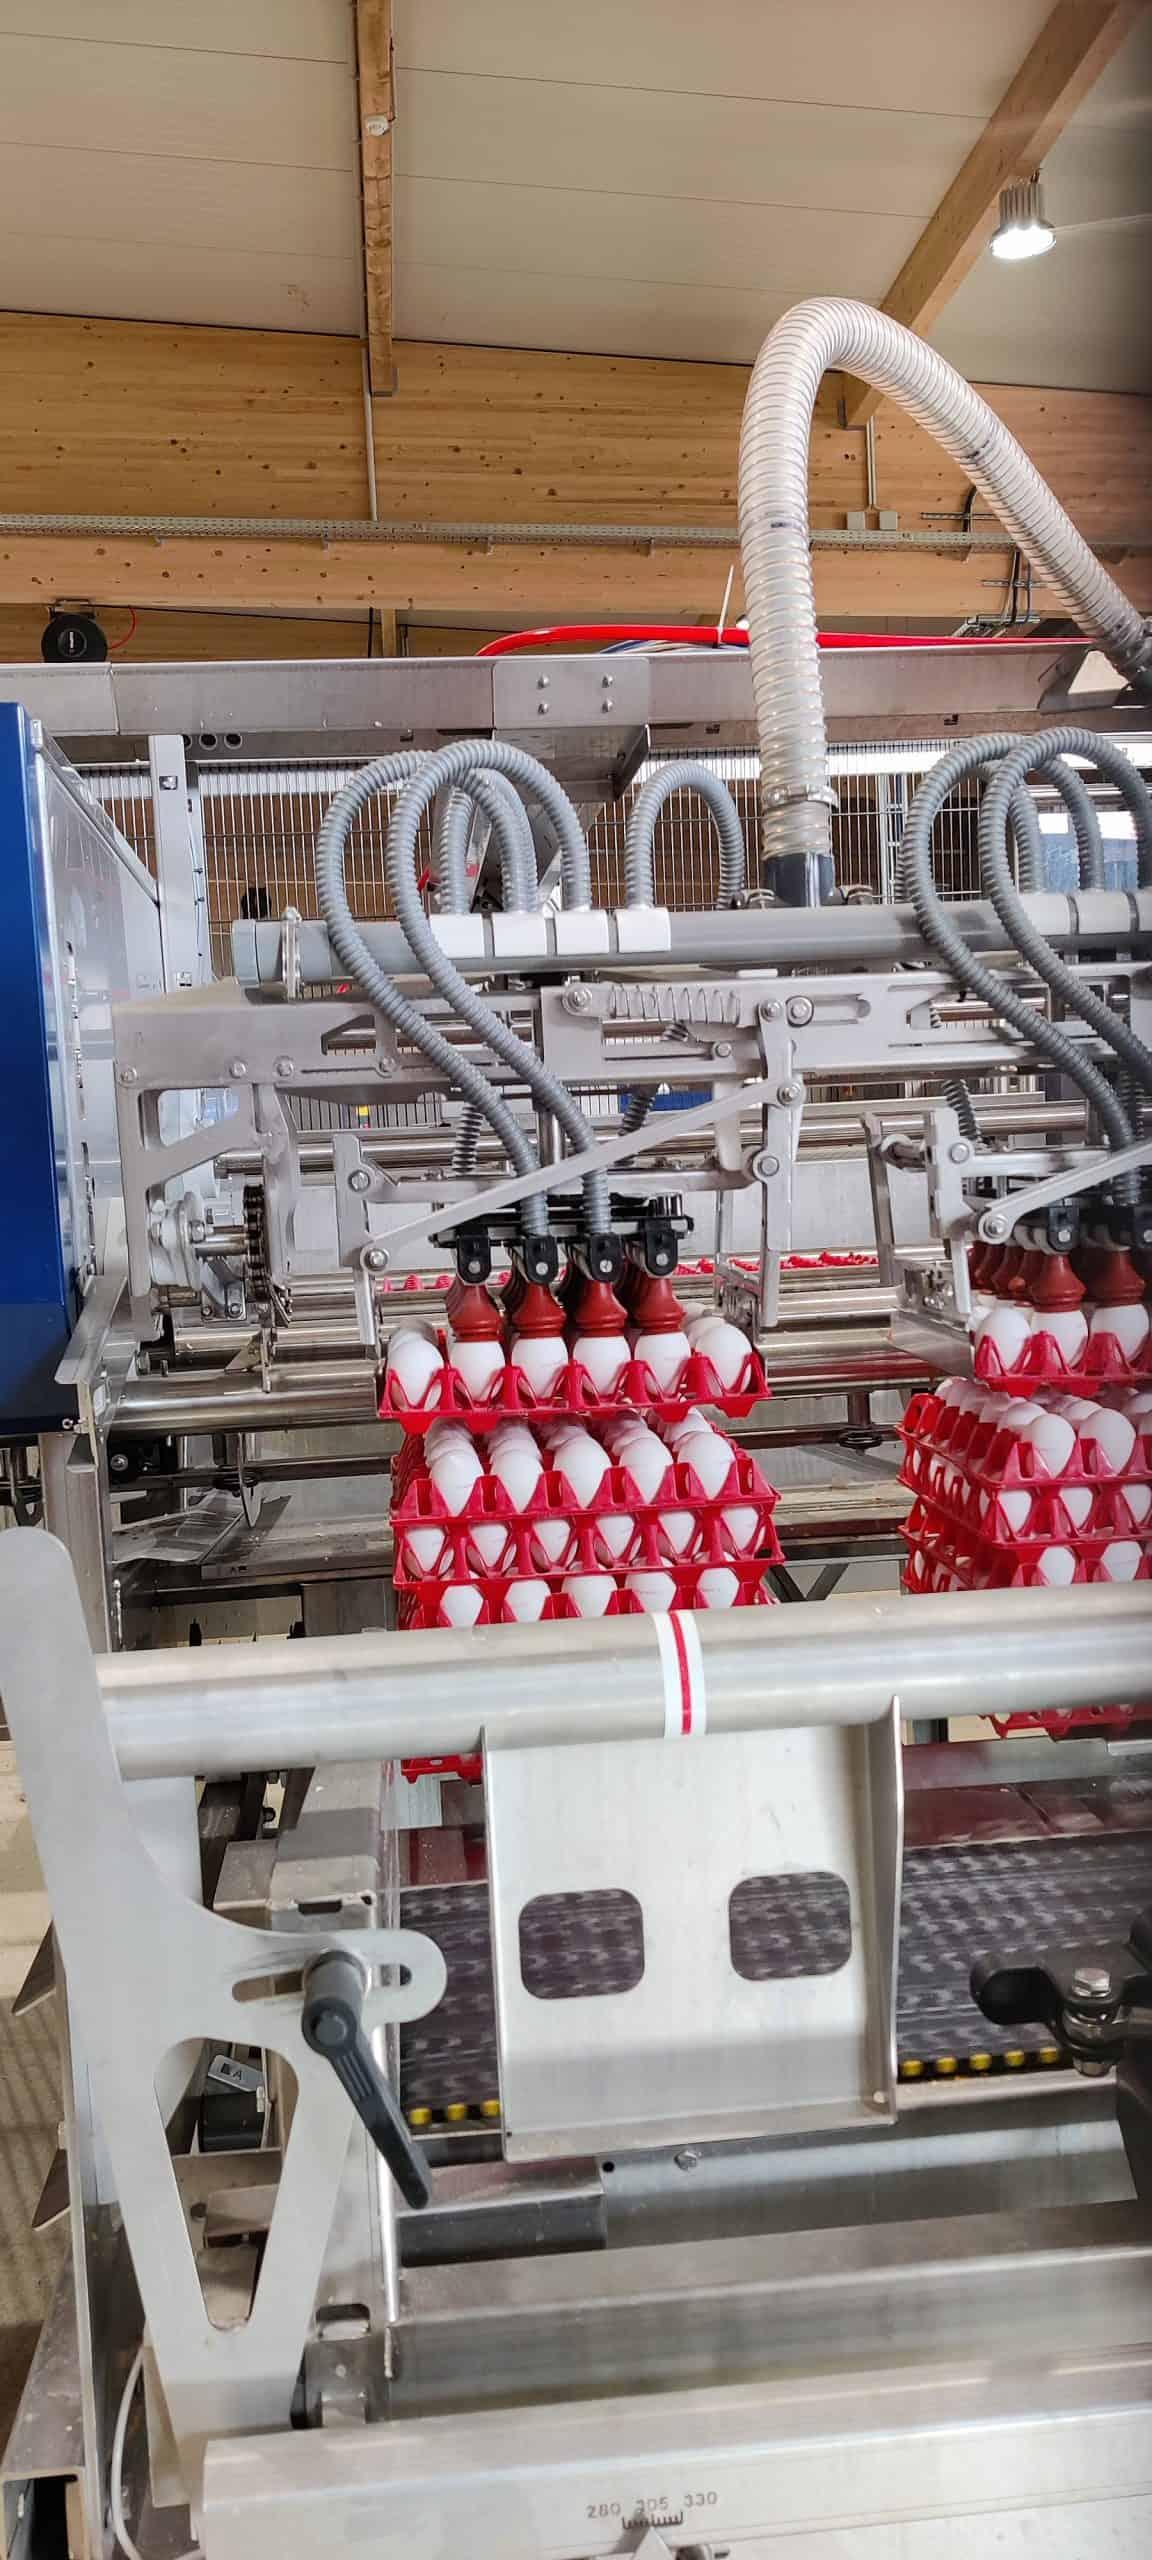 Hier werden rohe Eier sortiert bei Schrall Eier